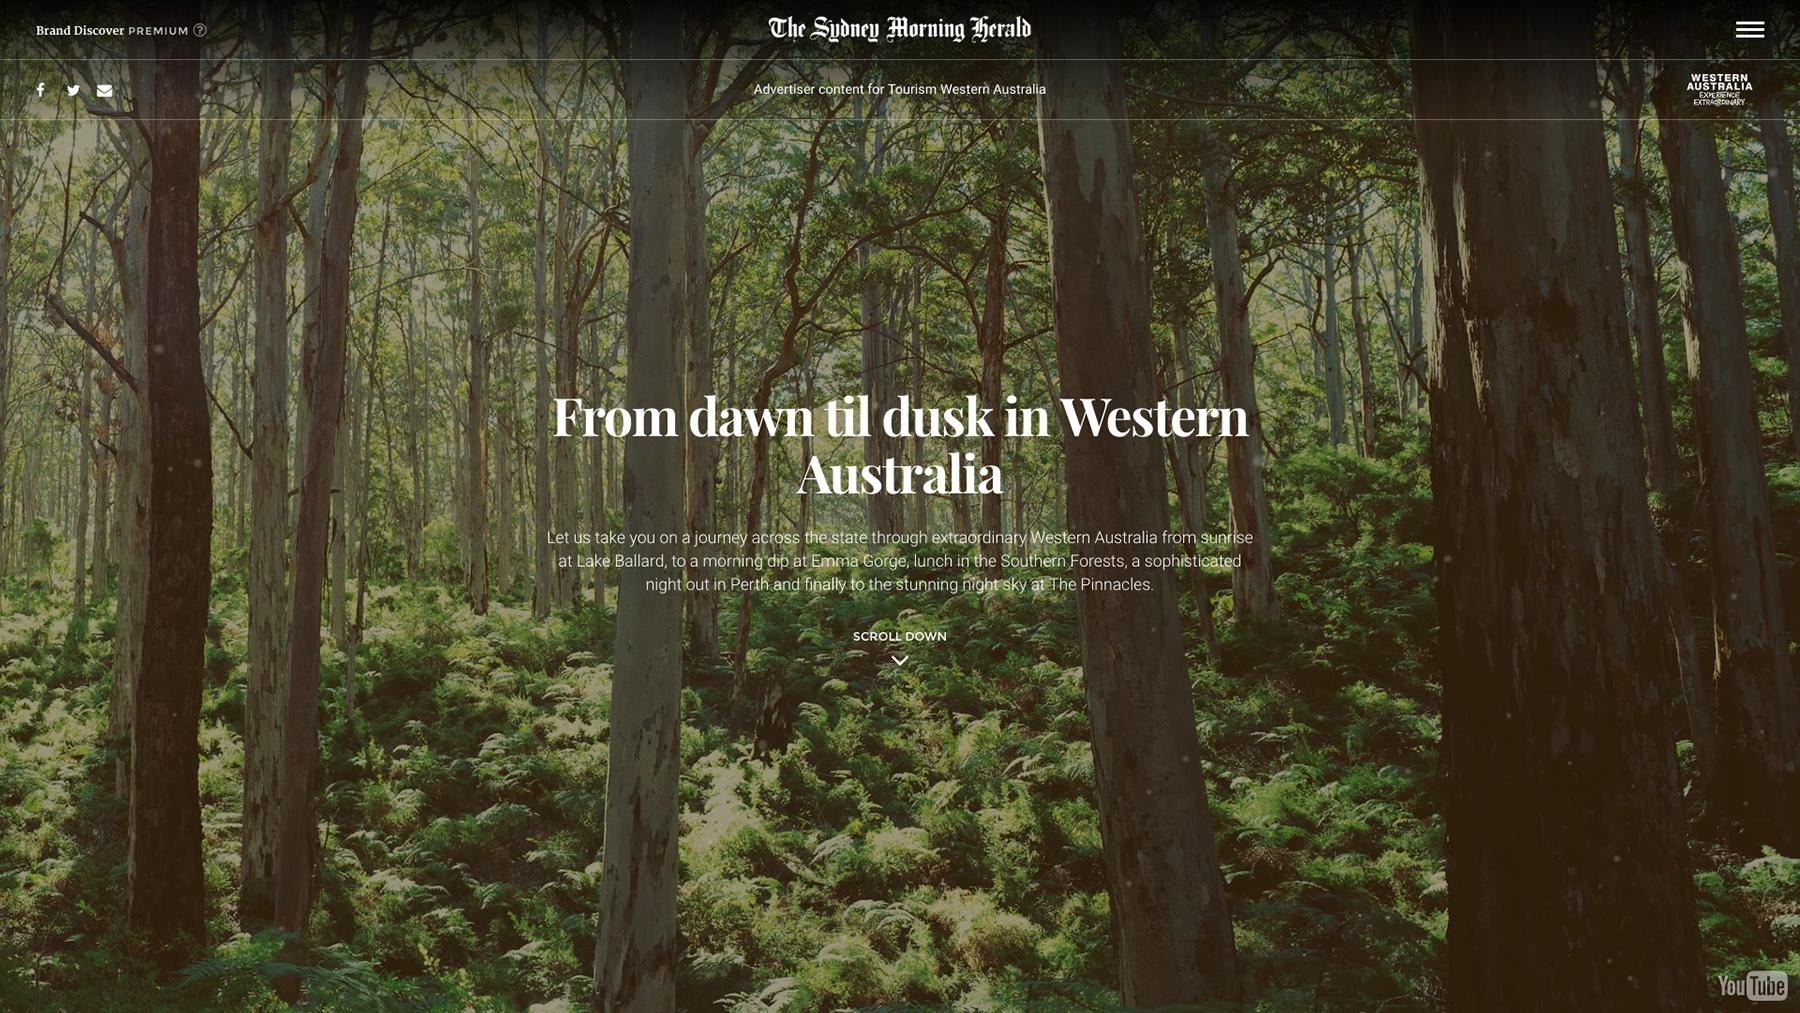 Tourism Western Australia Premium Brand Discover